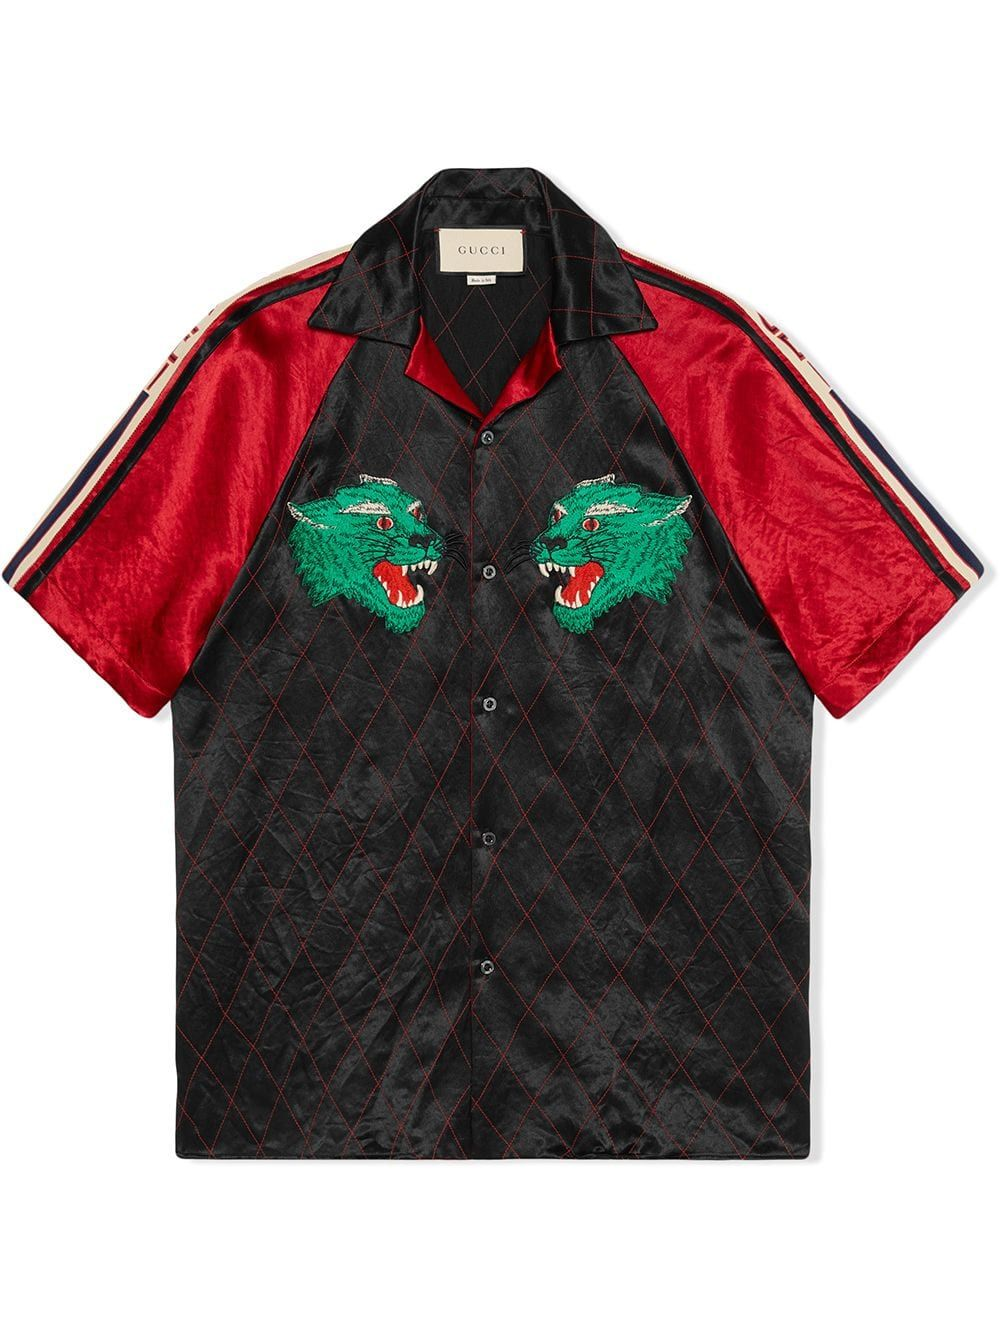 Gucci Panther Bowling Shirt Farfetch Bowling Shirts Shirts Minimalist Fashion Men [ 1334 x 1000 Pixel ]